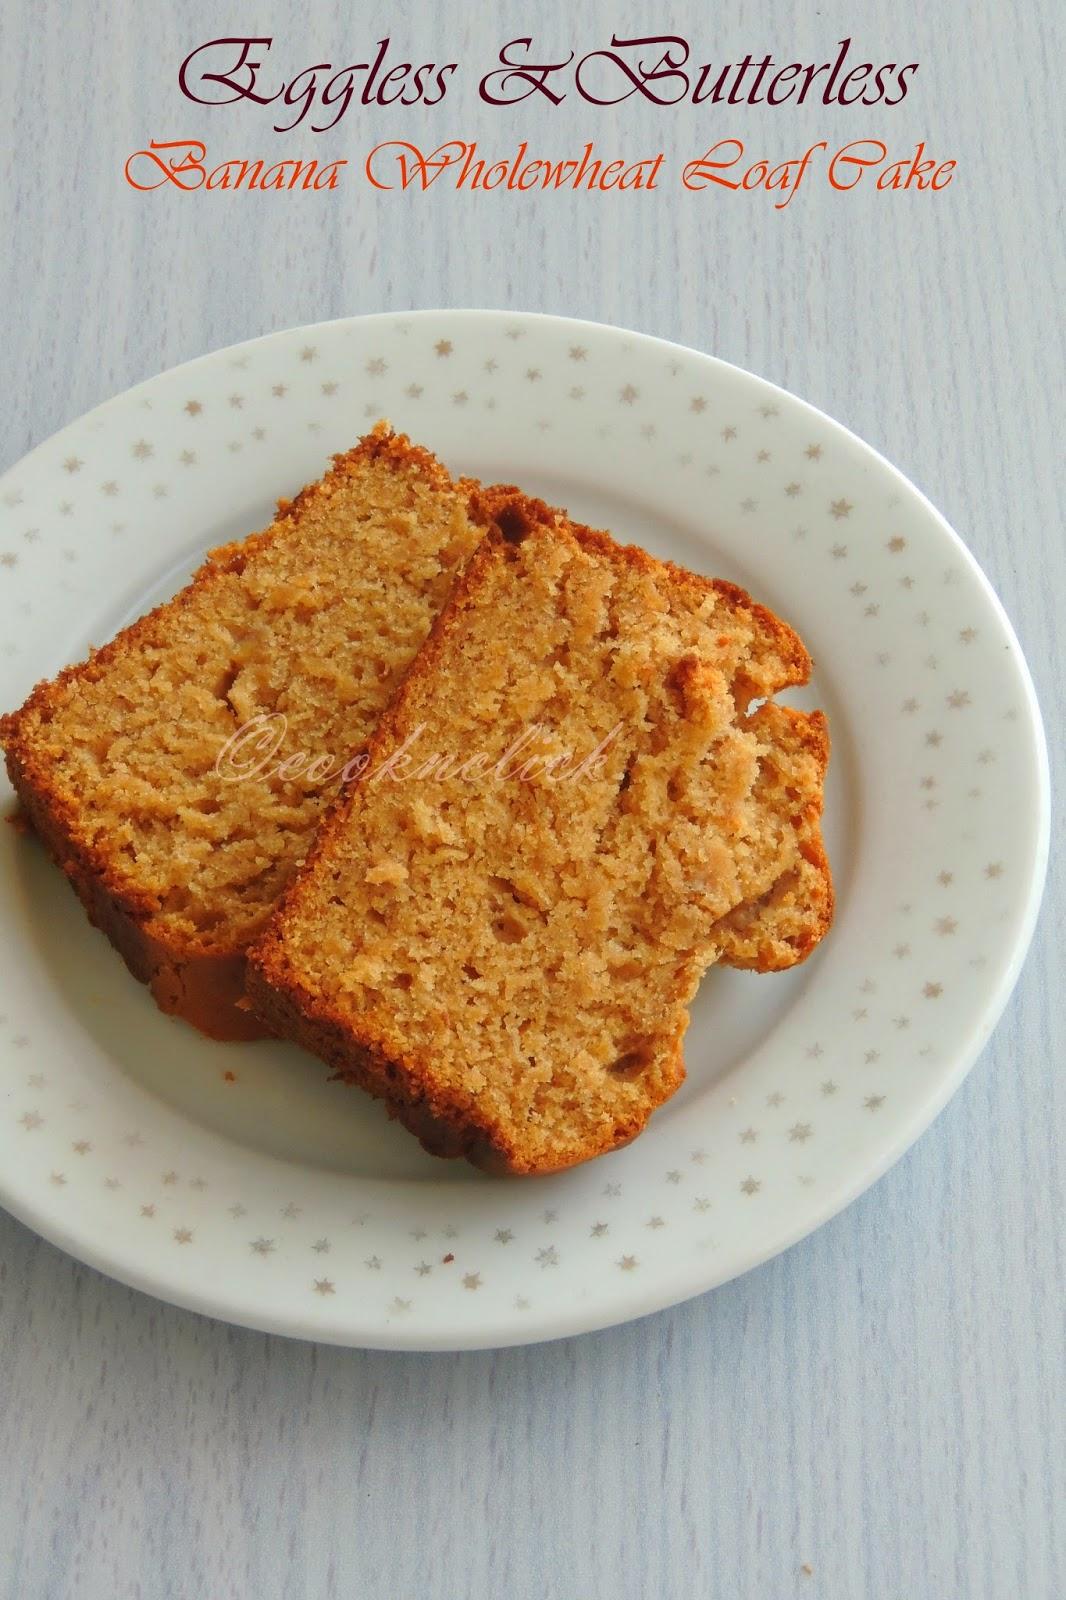 Loaf Cake, Eggless Banana Wholewheat cake, Butterless Loaf Cake